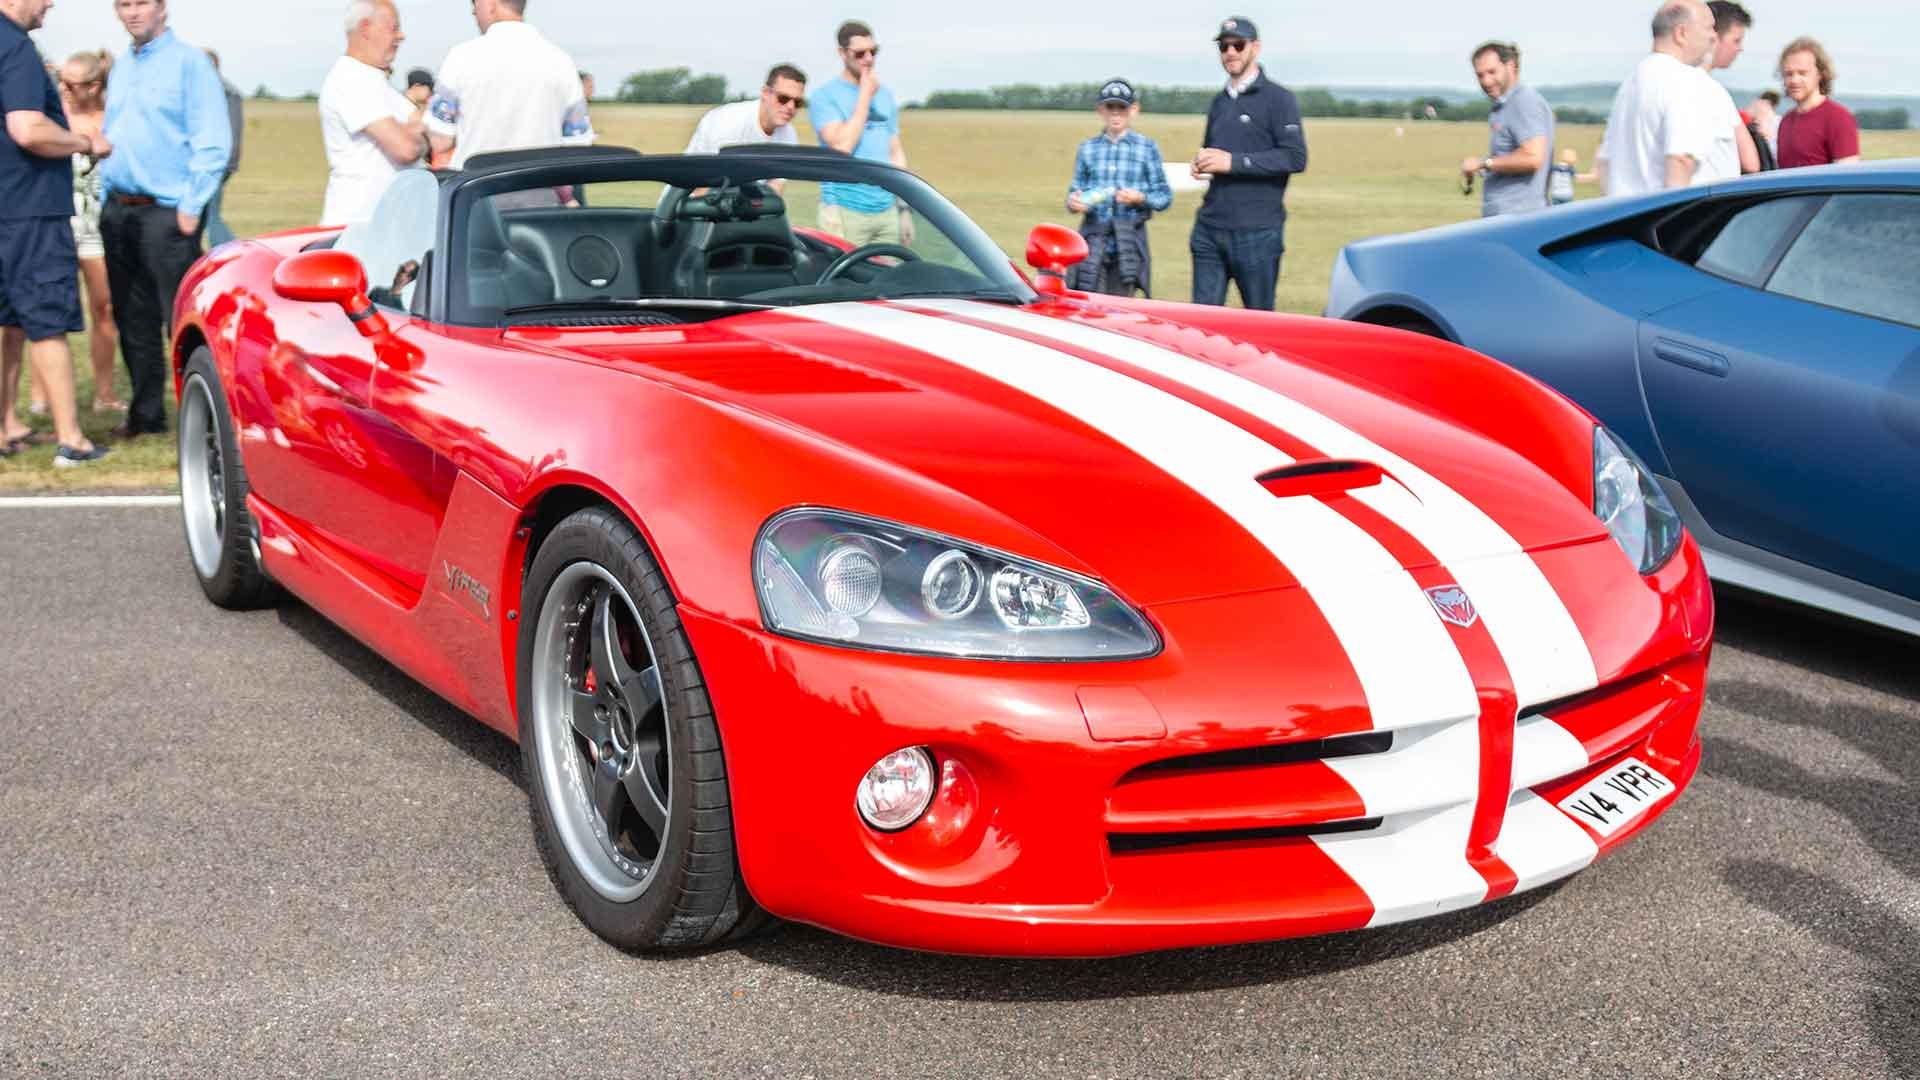 Dodge Viper at Goodwood Supercar Sunday